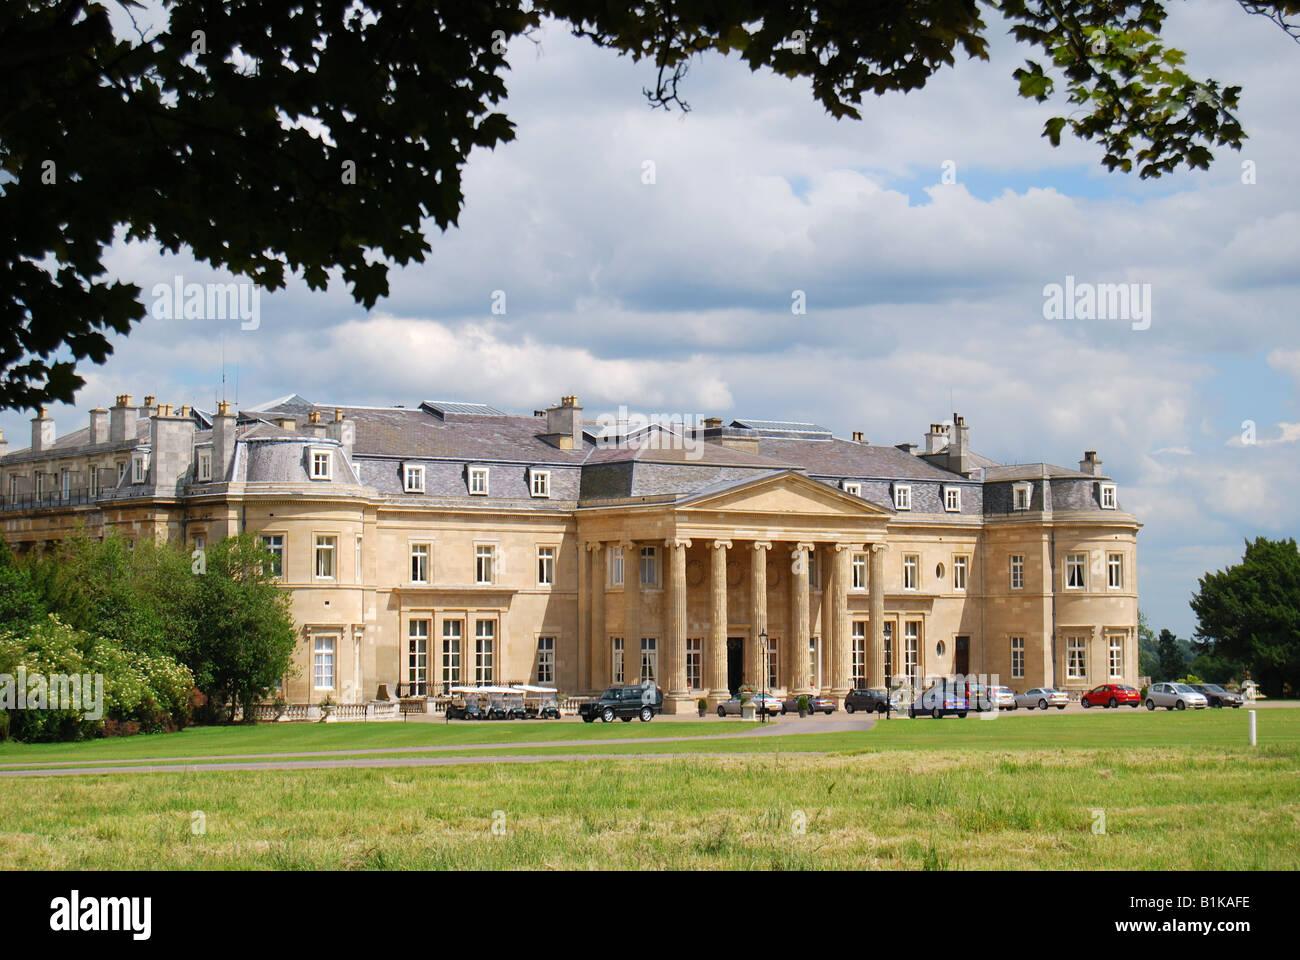 Luton Hoo Hotel Golf Spa Luton Bedfordshire England